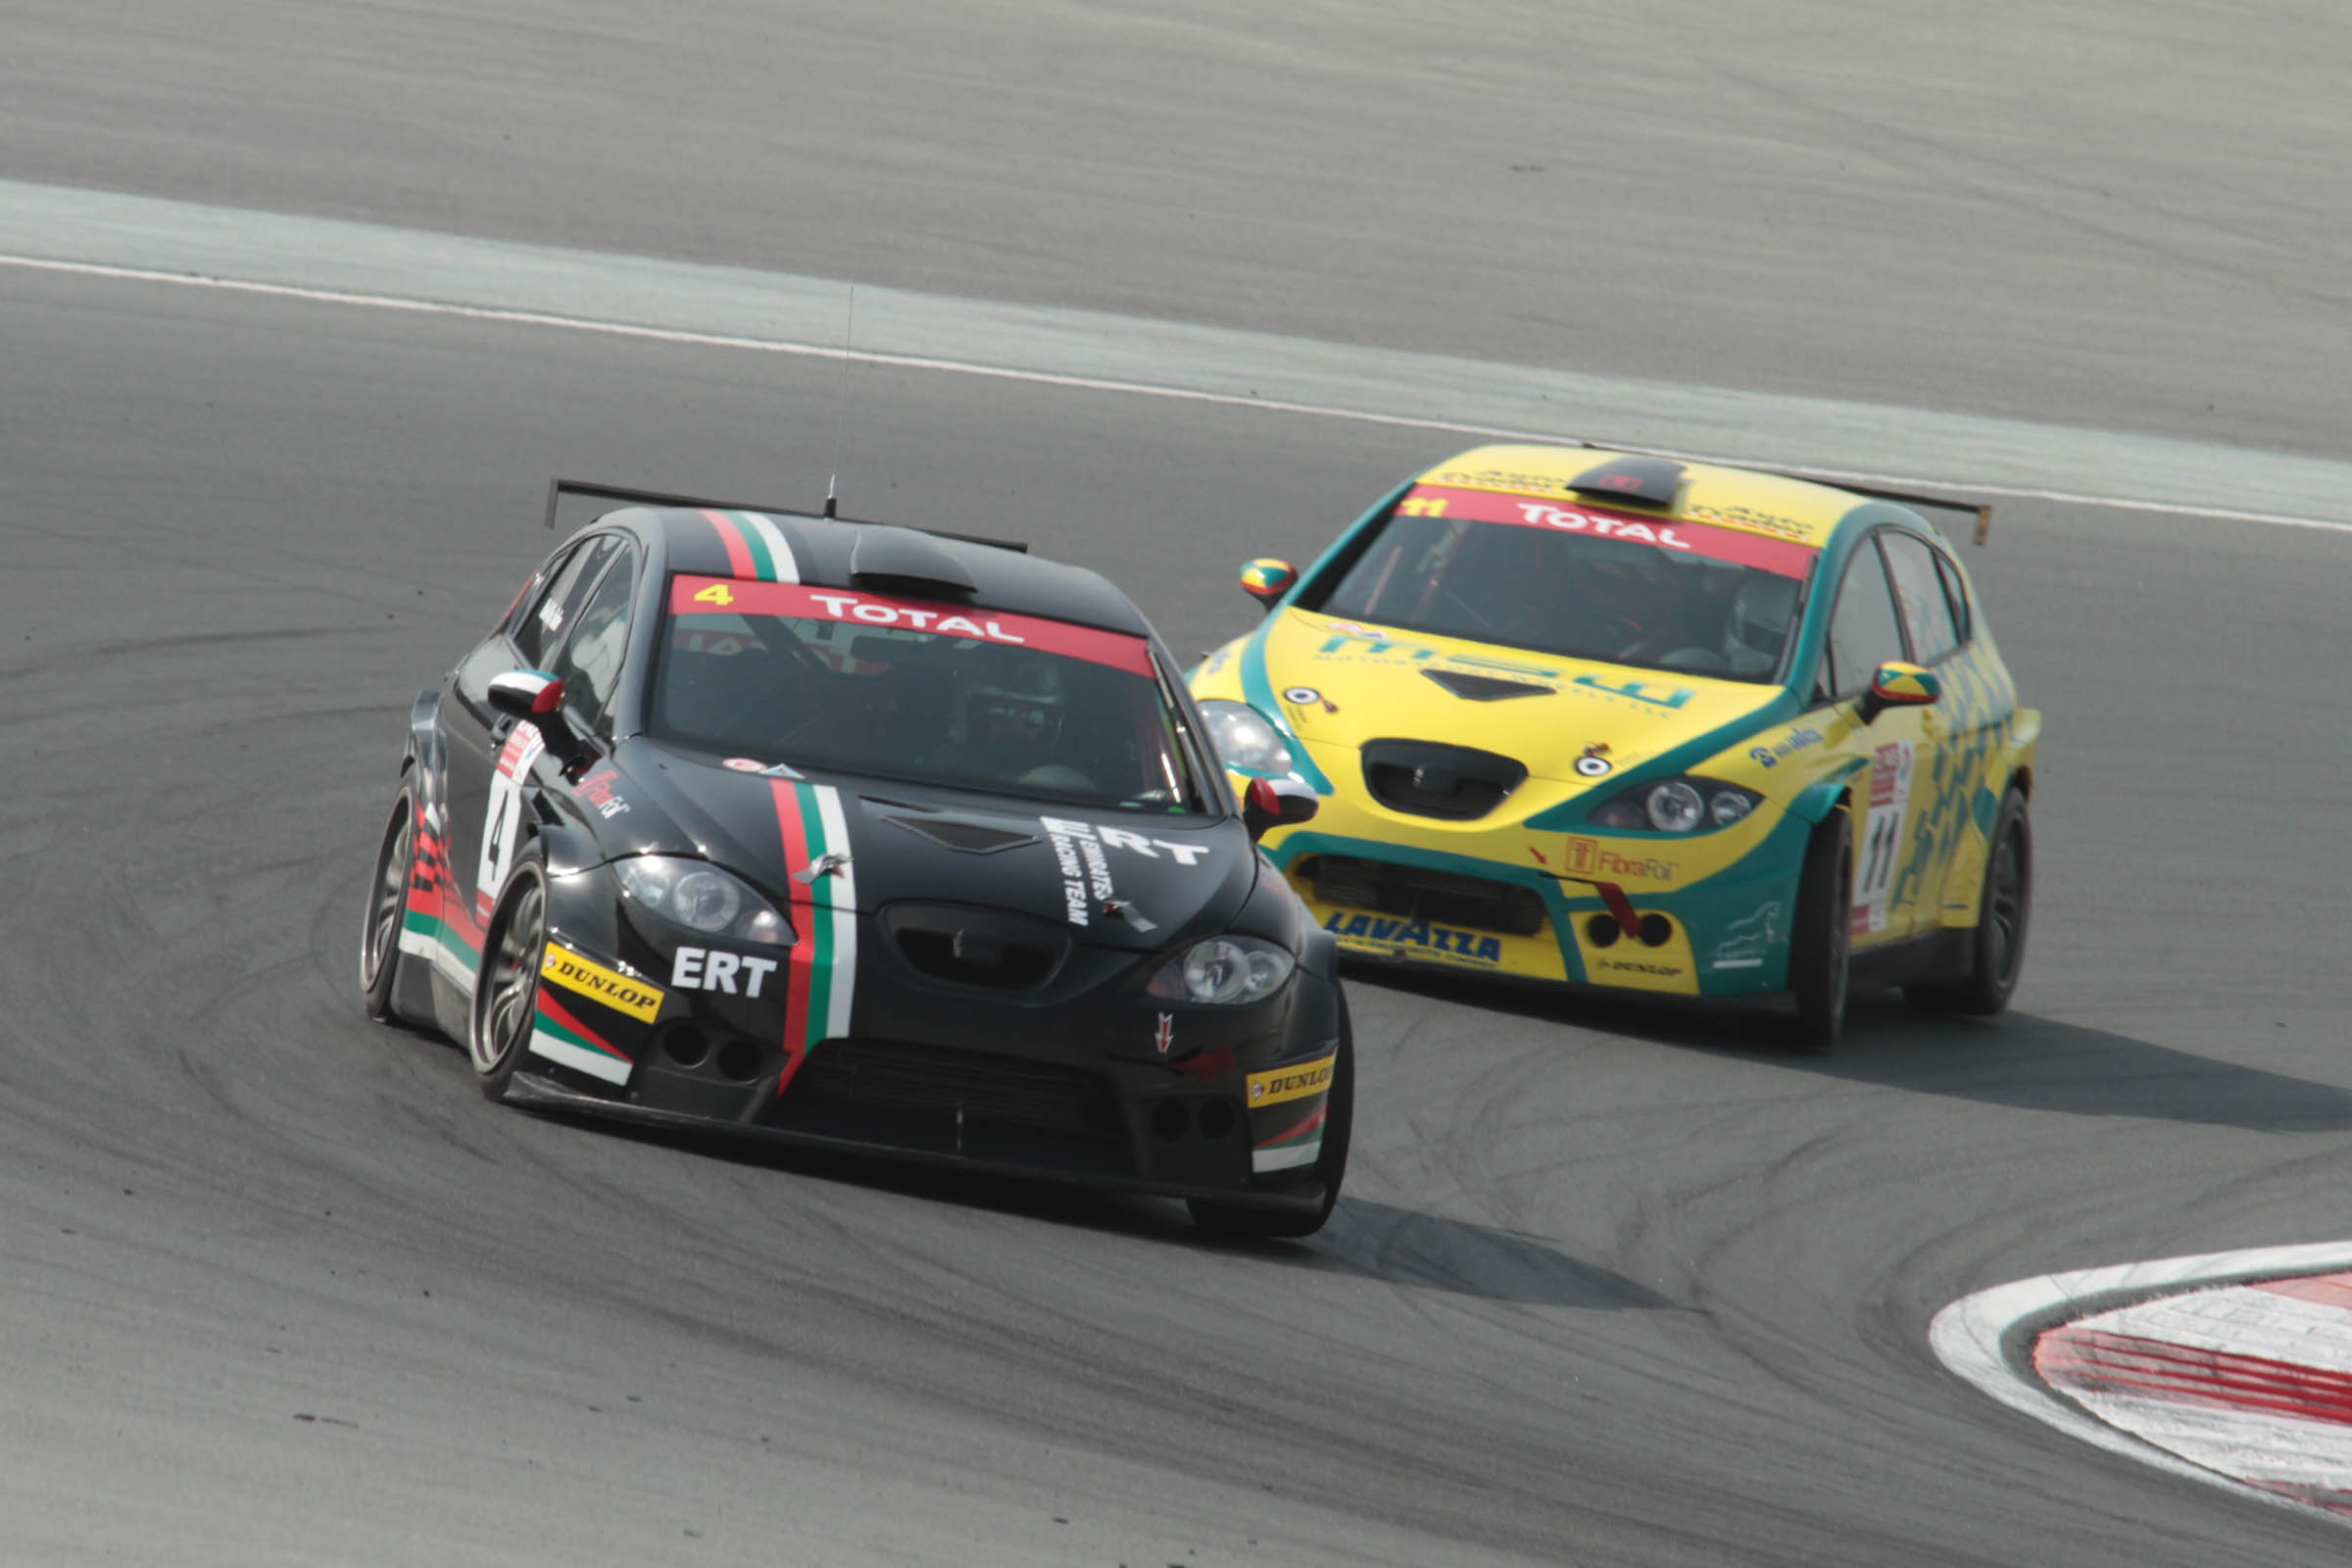 Gallery: UAE National Raceday 1, Oct 7th 2010, Dubai Autodrome